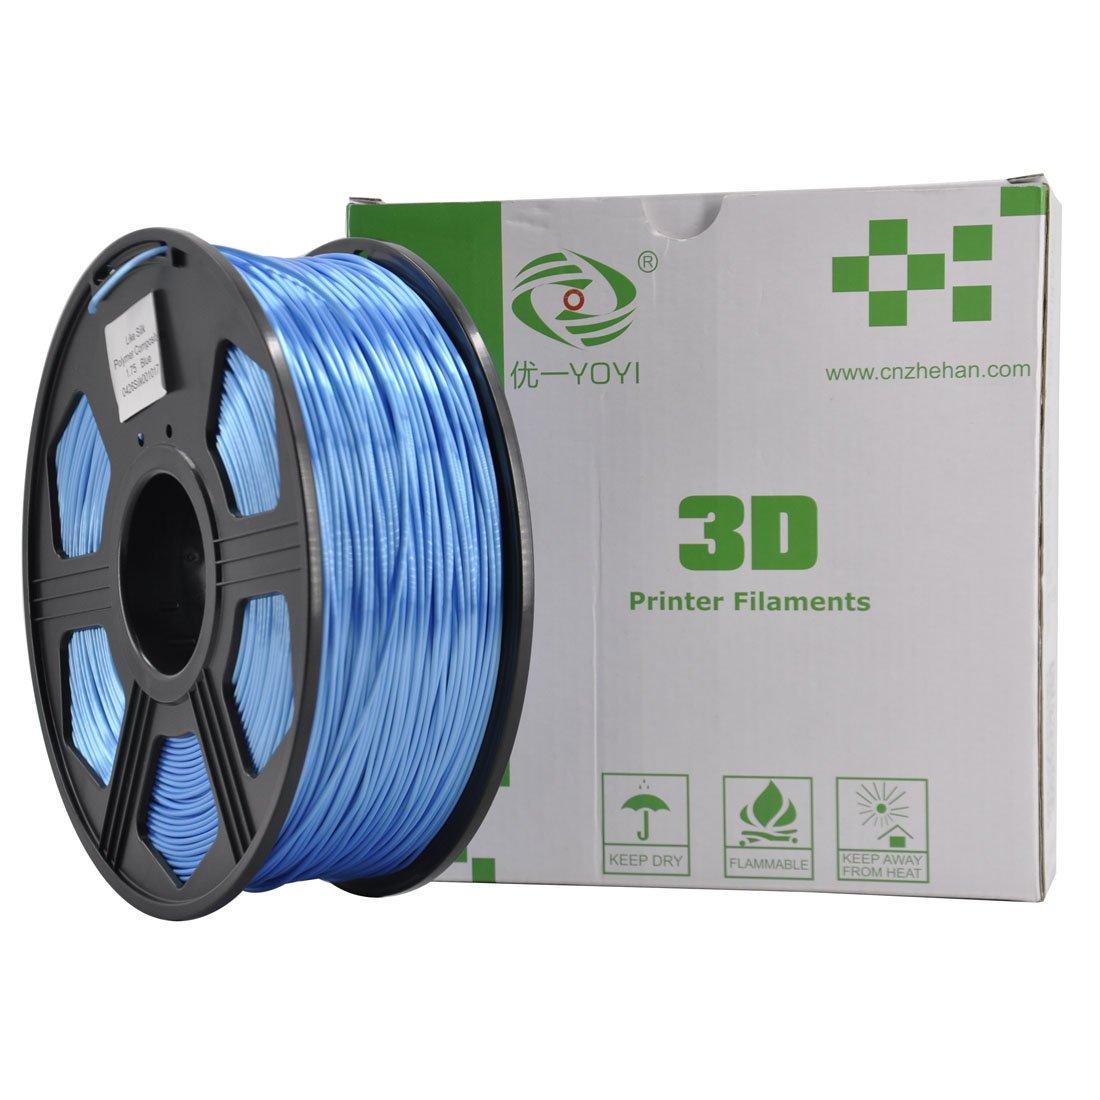 0.03 mm // YOYI 3D Printer Filament Silk PLA 1.75mm,Dimensional Accuracy 1kg Spool,100/% Virgin Raw Material,Blue